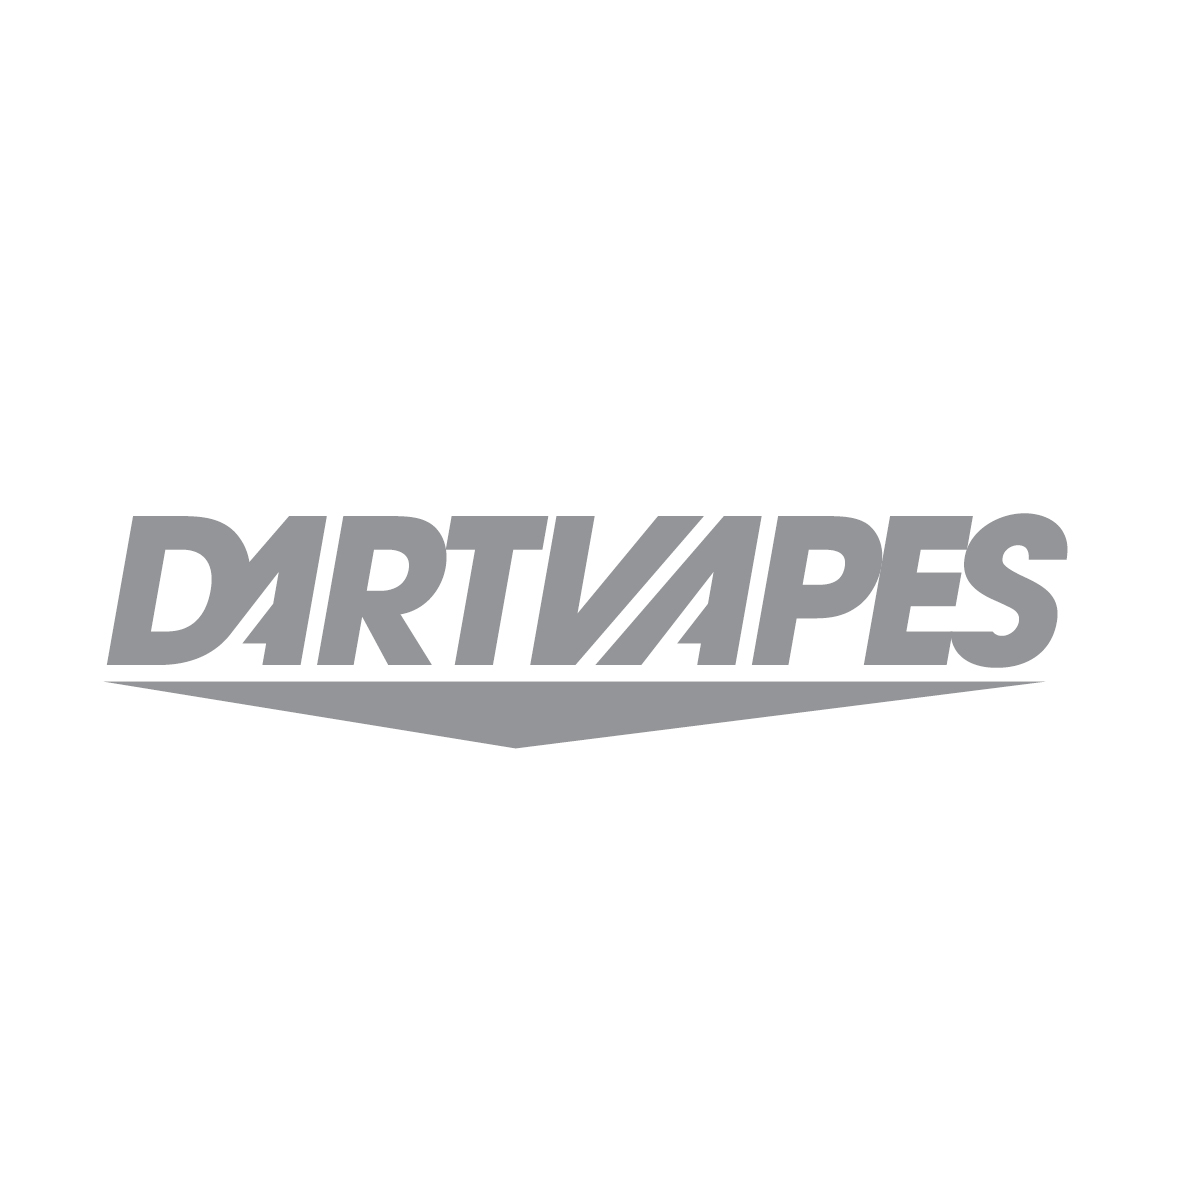 Logo - Dart Vapes.jpg